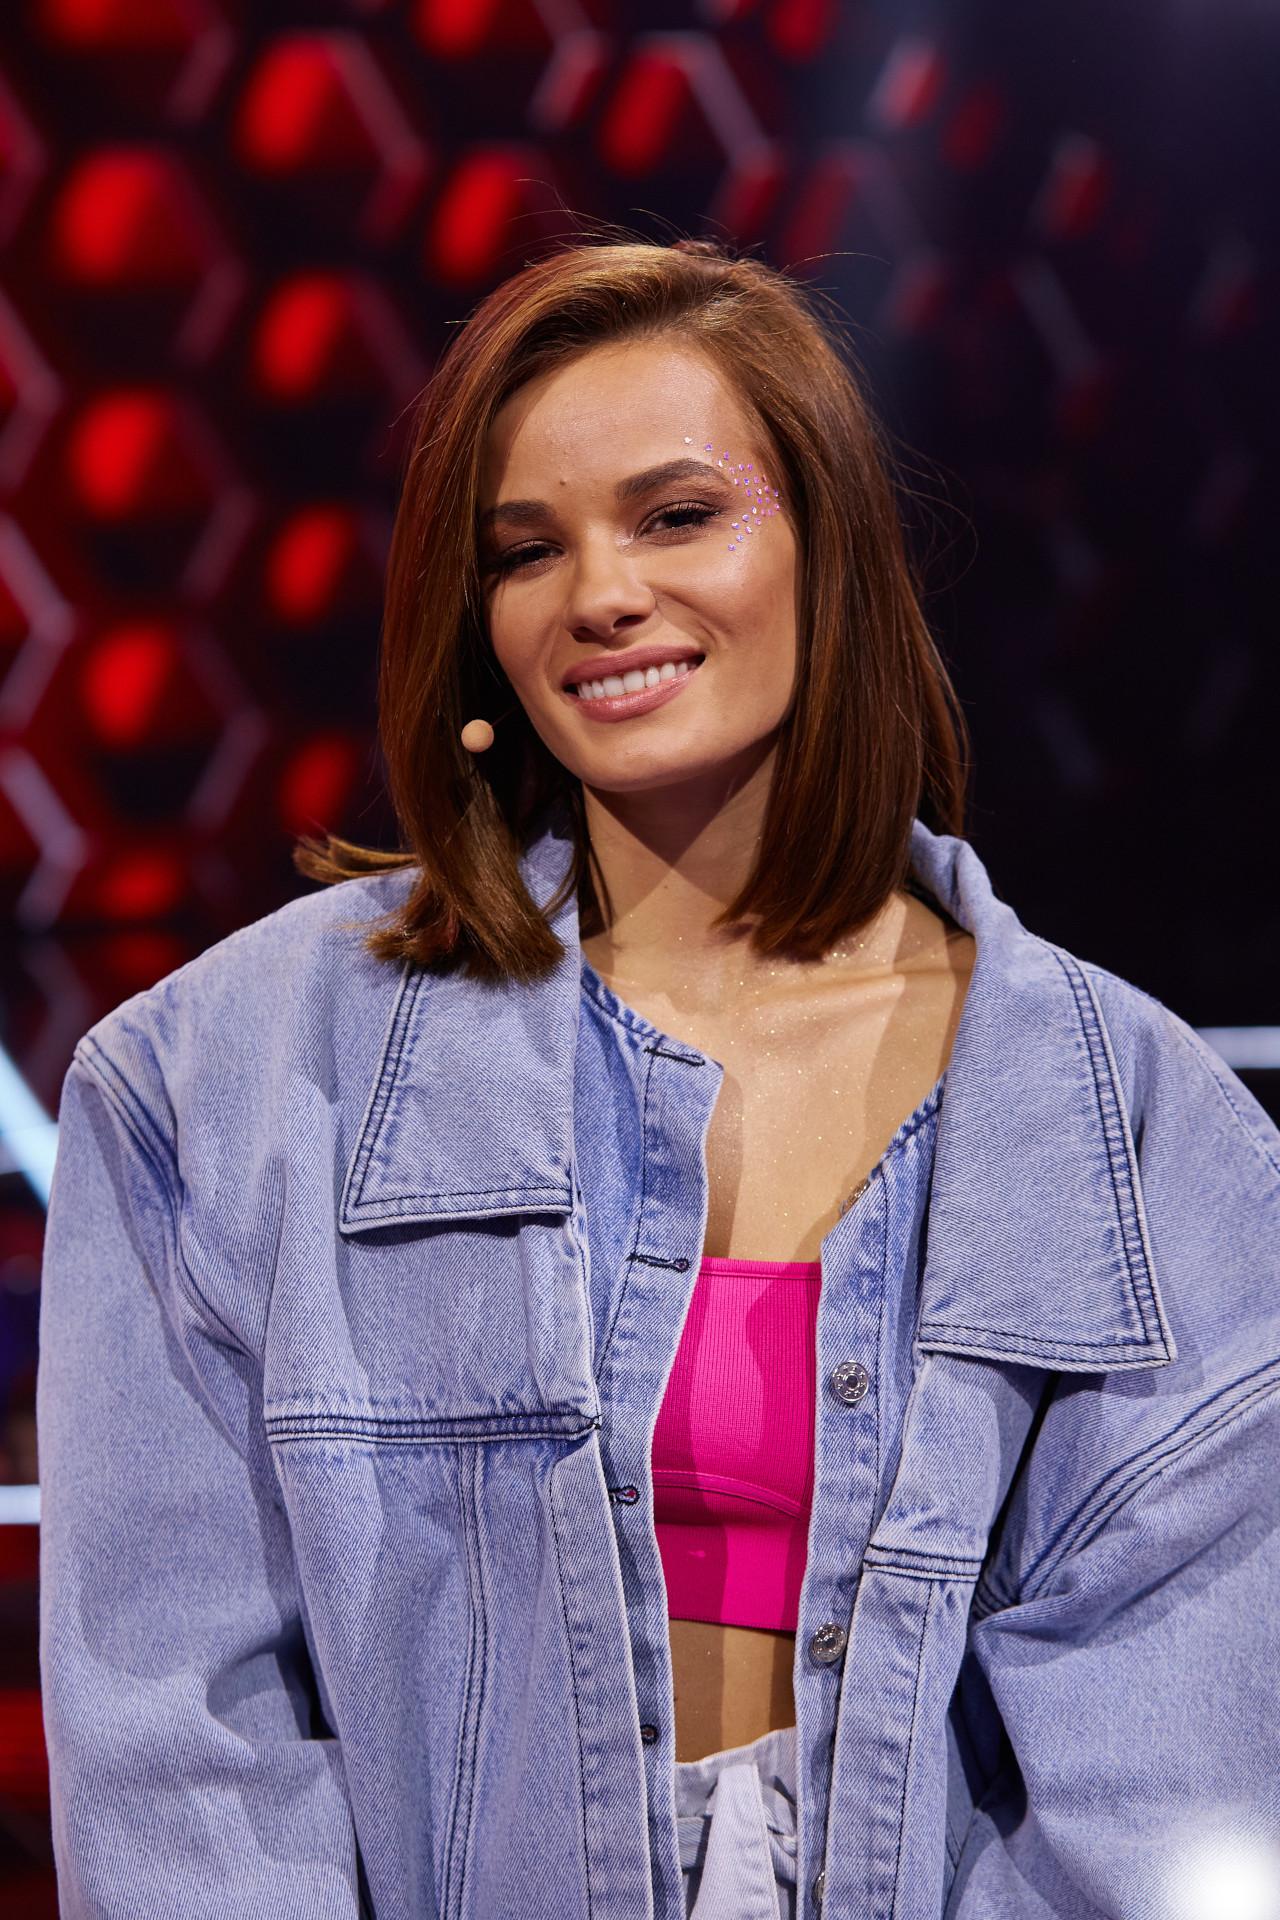 Natalia Nykiel, fot. Krystian Szczęsny / Polsat